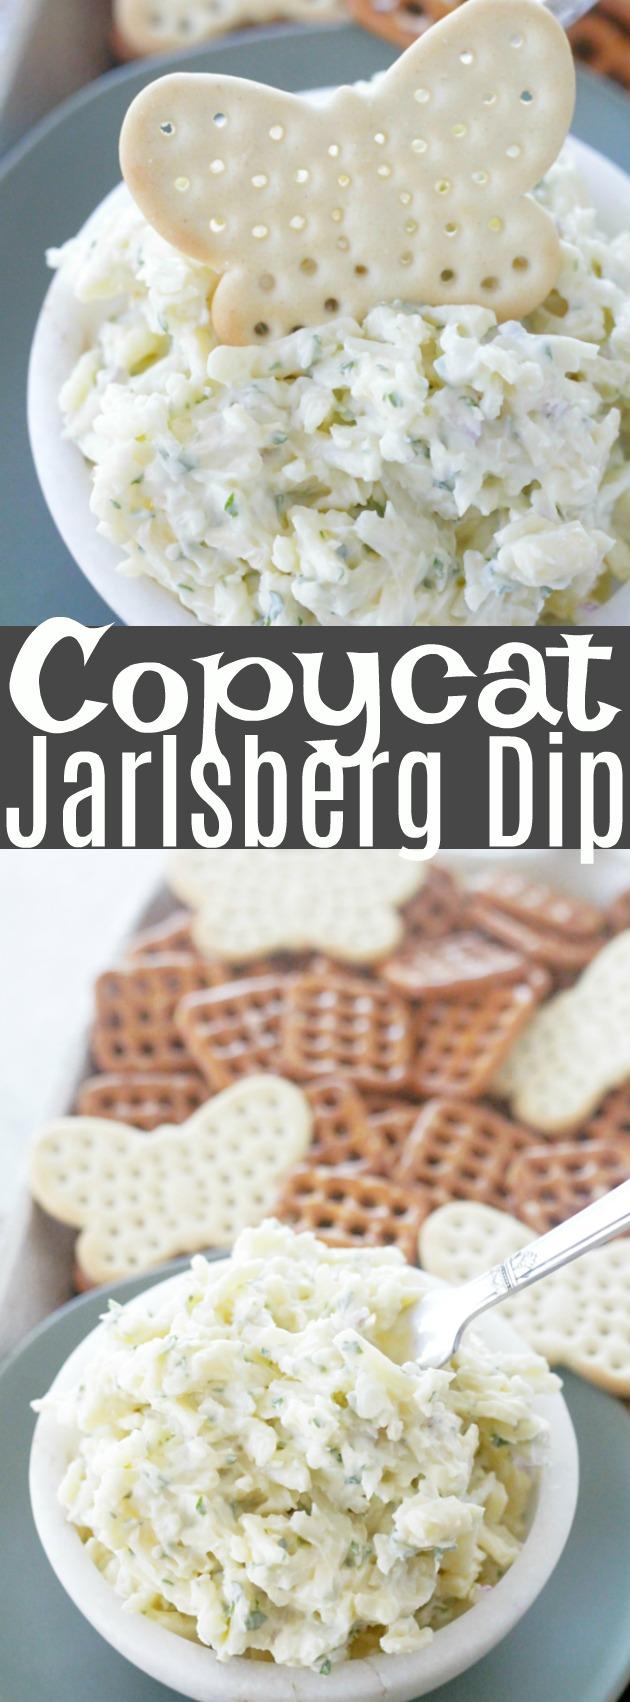 Copycat Jarlsberg Dip